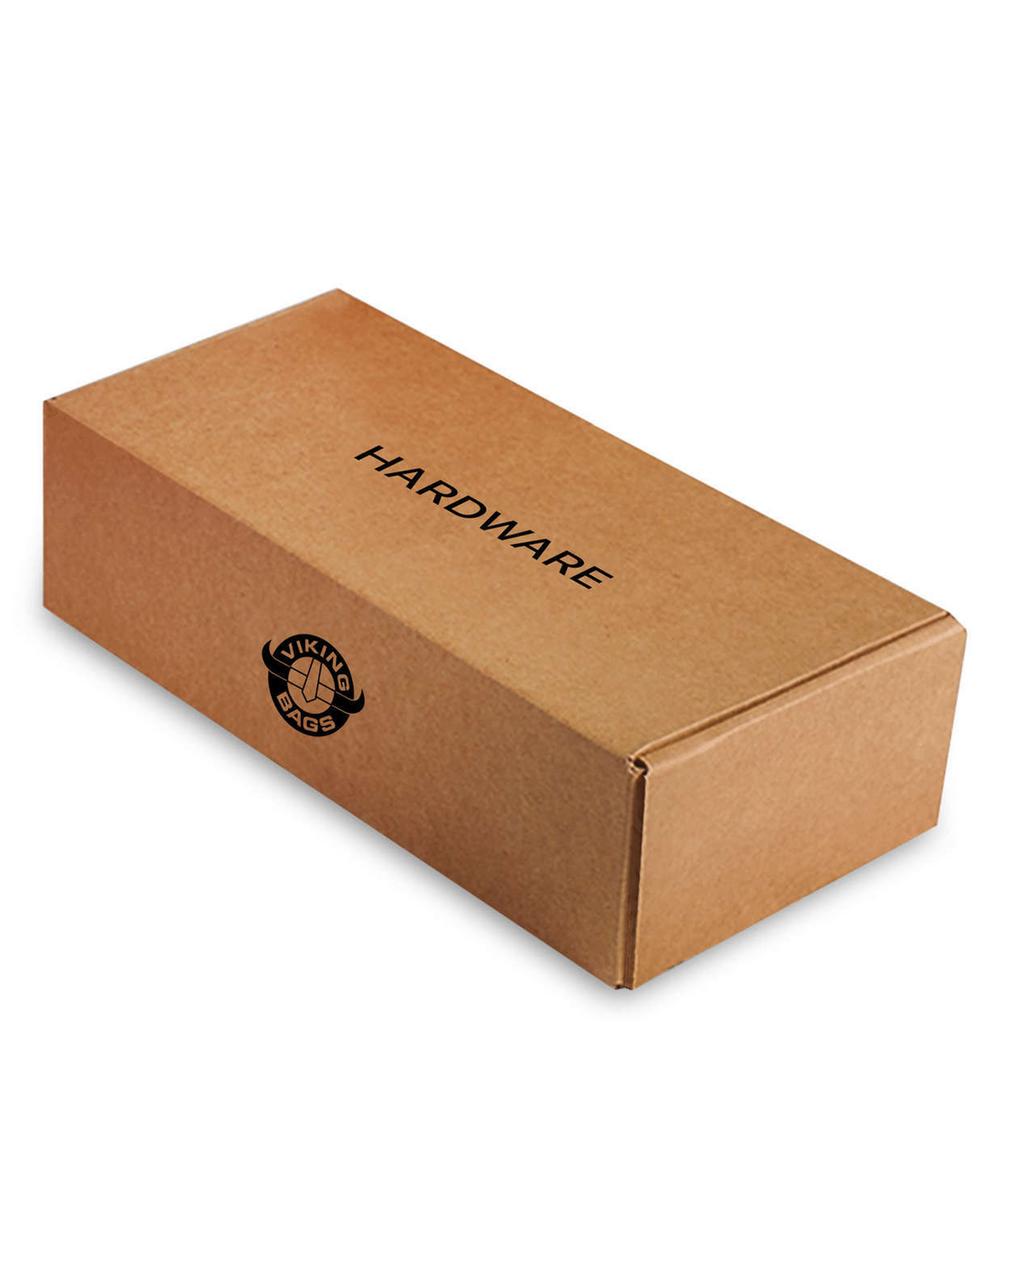 Triumph Thunderbird Spear Shock Cutout Studded Large Motorcycle Saddlebags Box